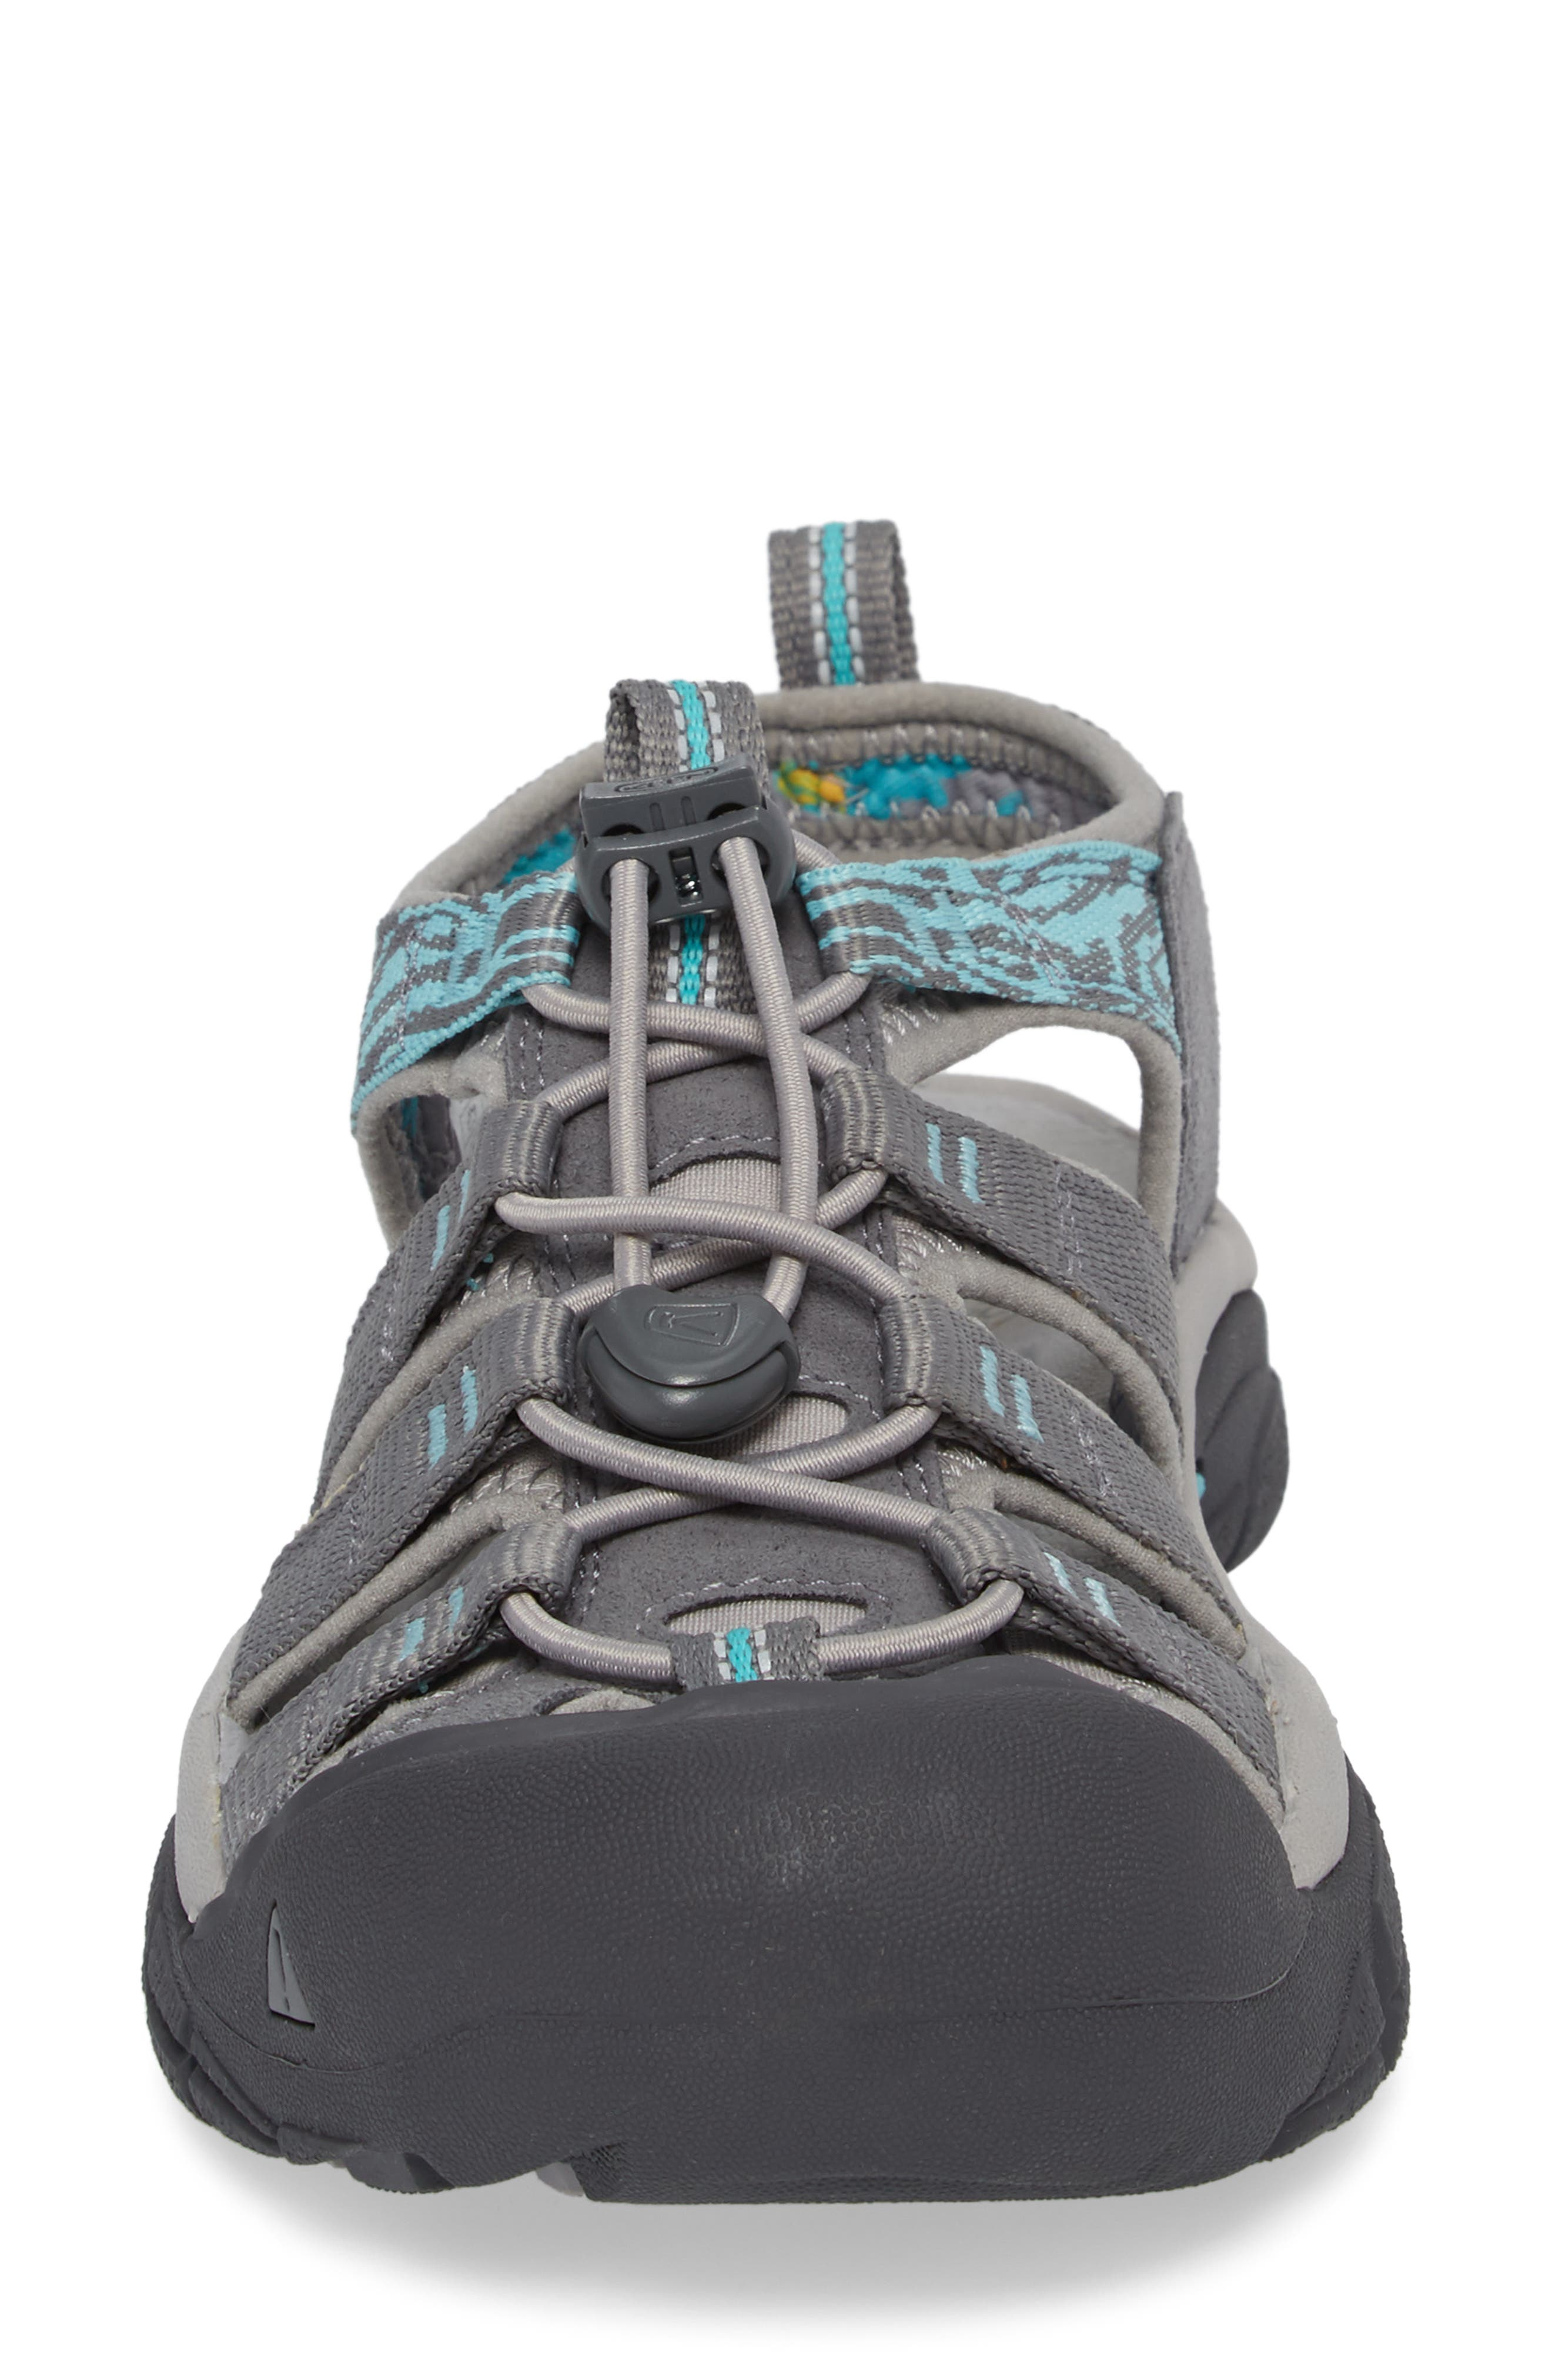 Newport Hydro Sandal,                             Alternate thumbnail 4, color,                             STEEL GREY/ BLUE TURQUOISE